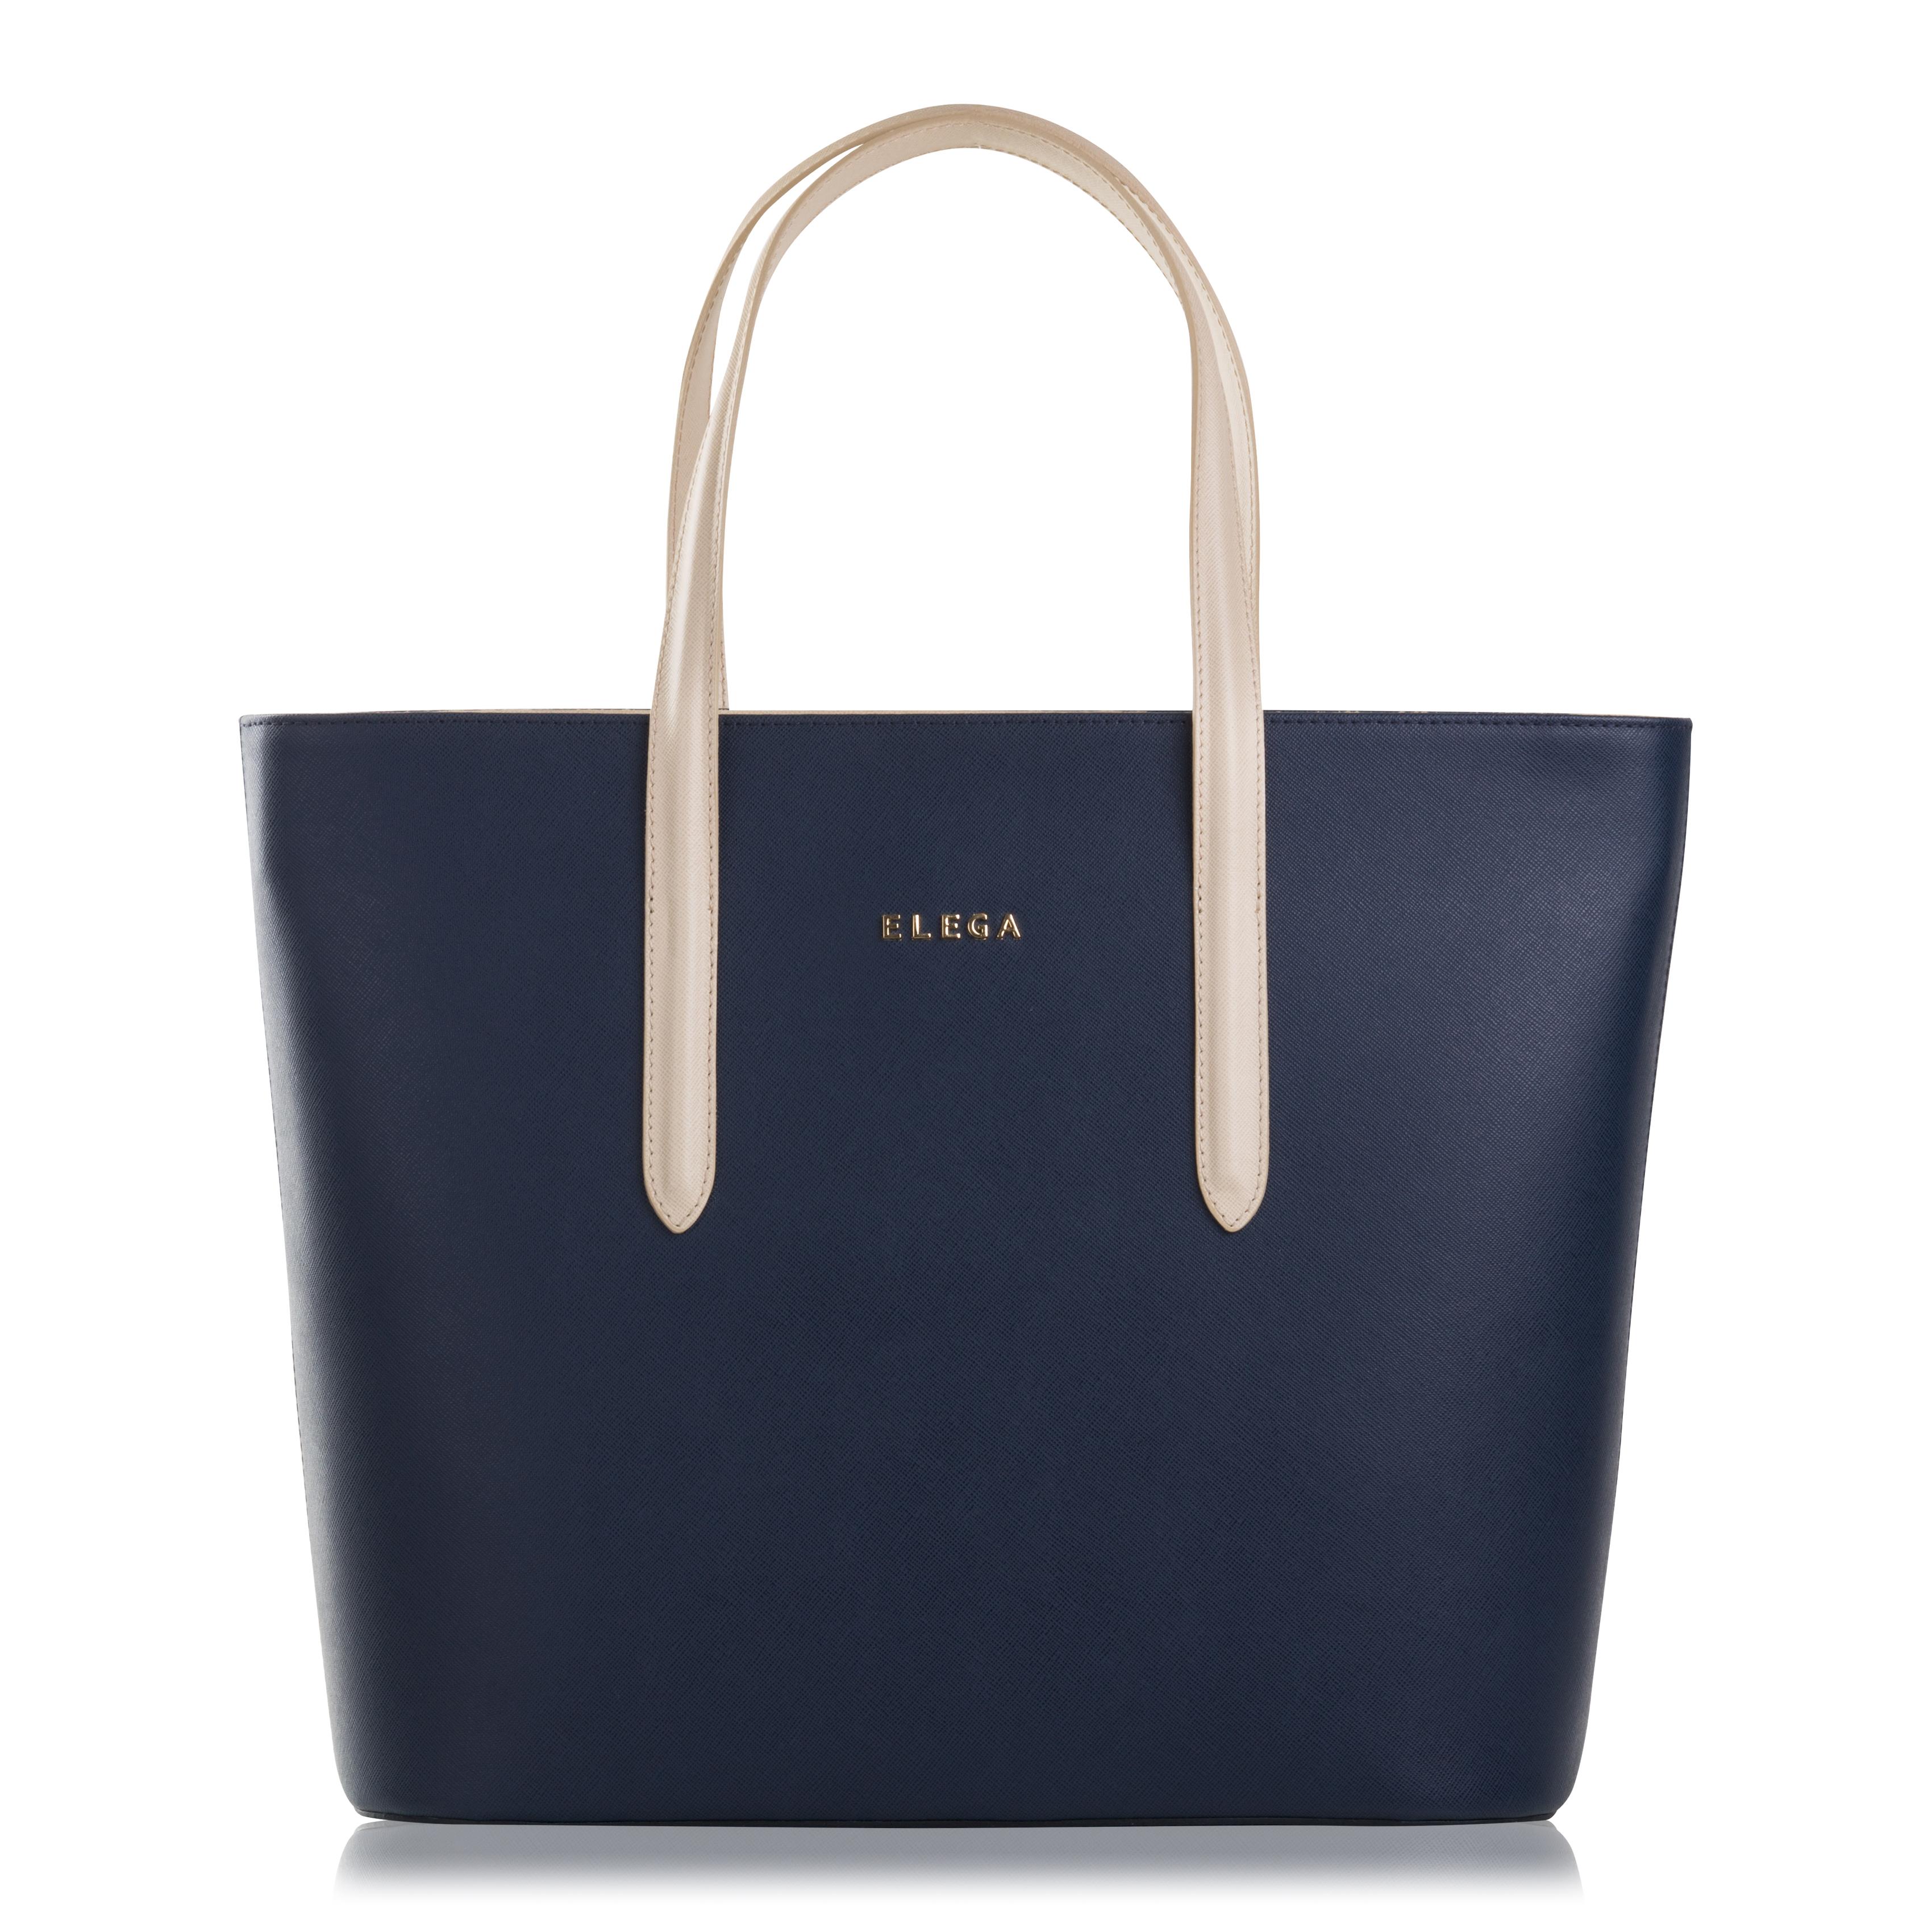 Kabelka shopperka Neapol DUO Simply modrá/béžová